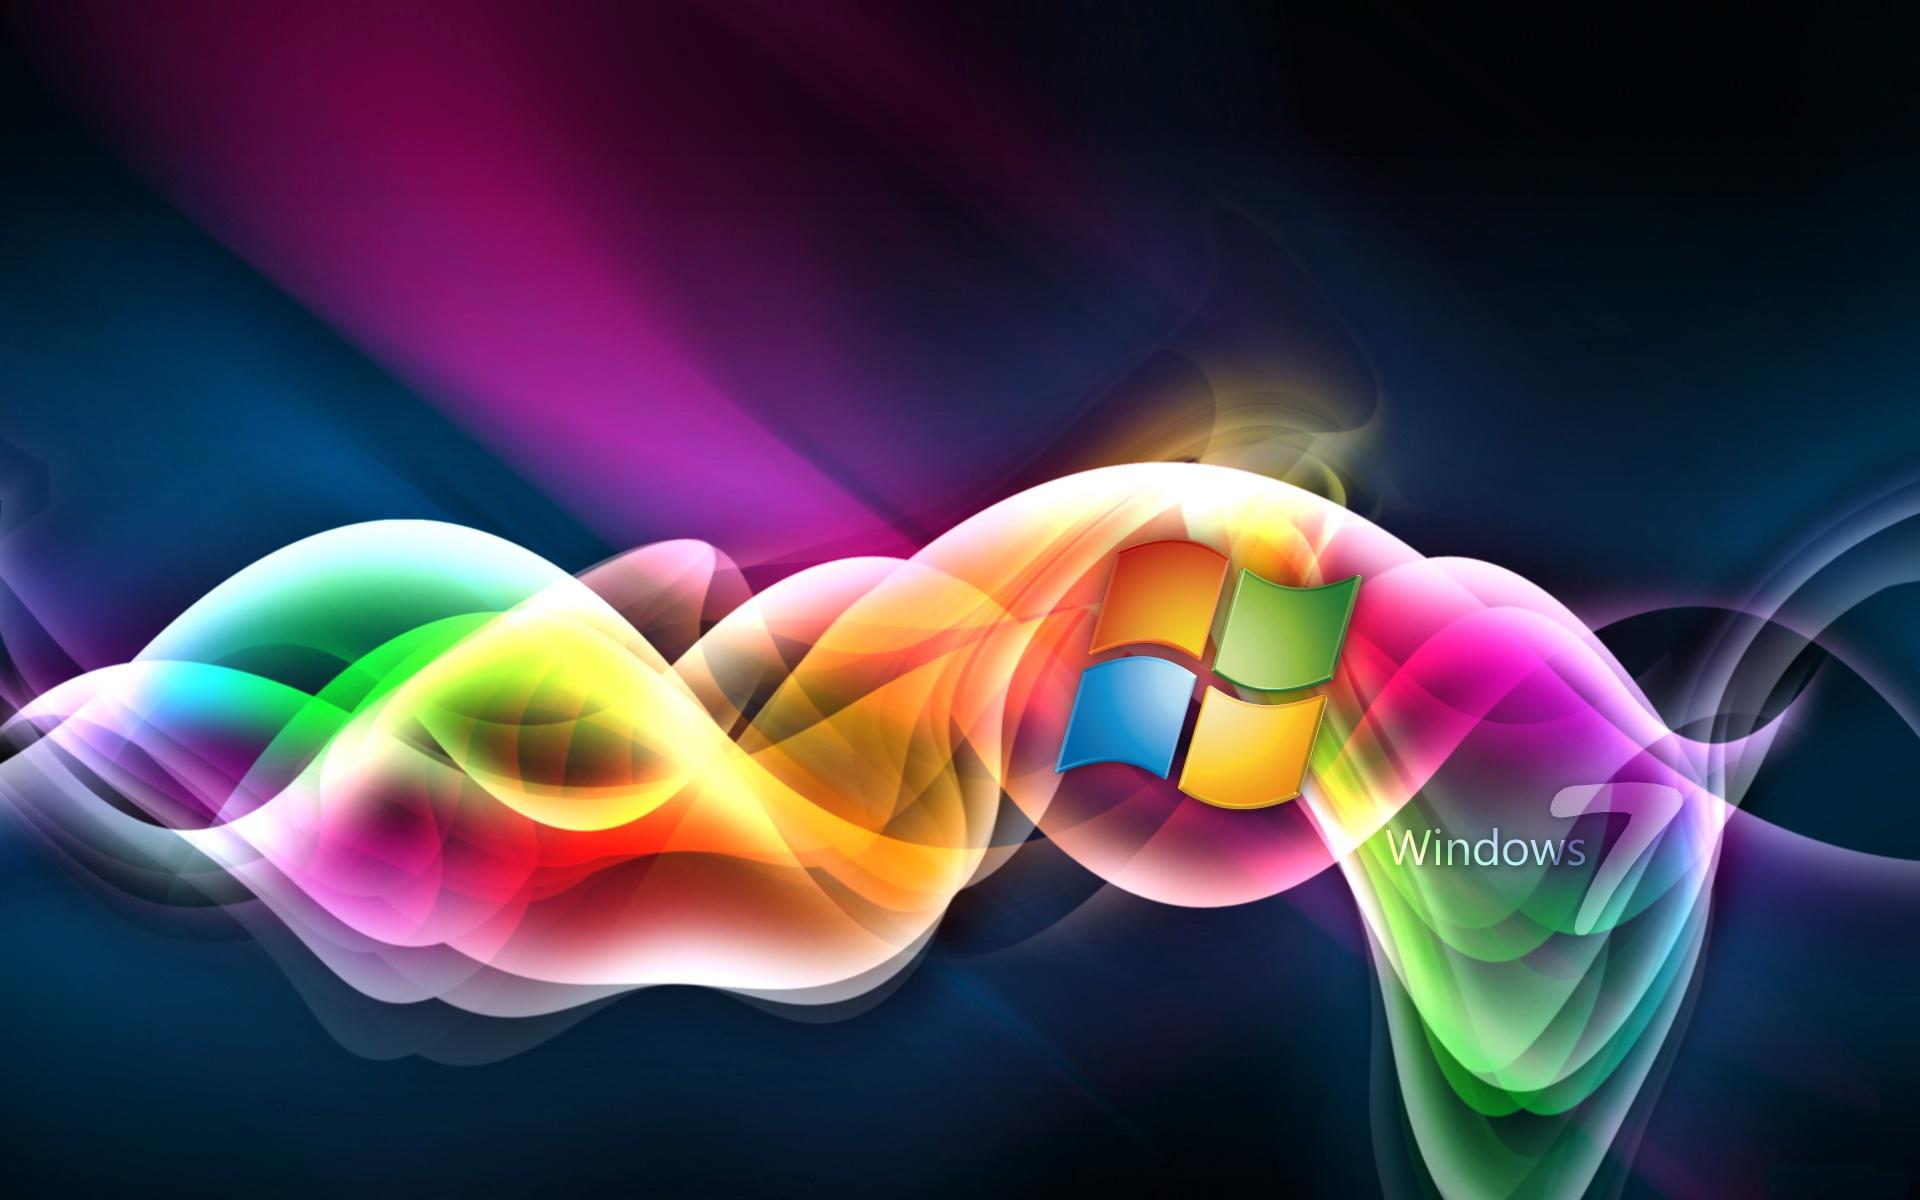 50 Windows 7 Wallpaper Themes On Wallpapersafari